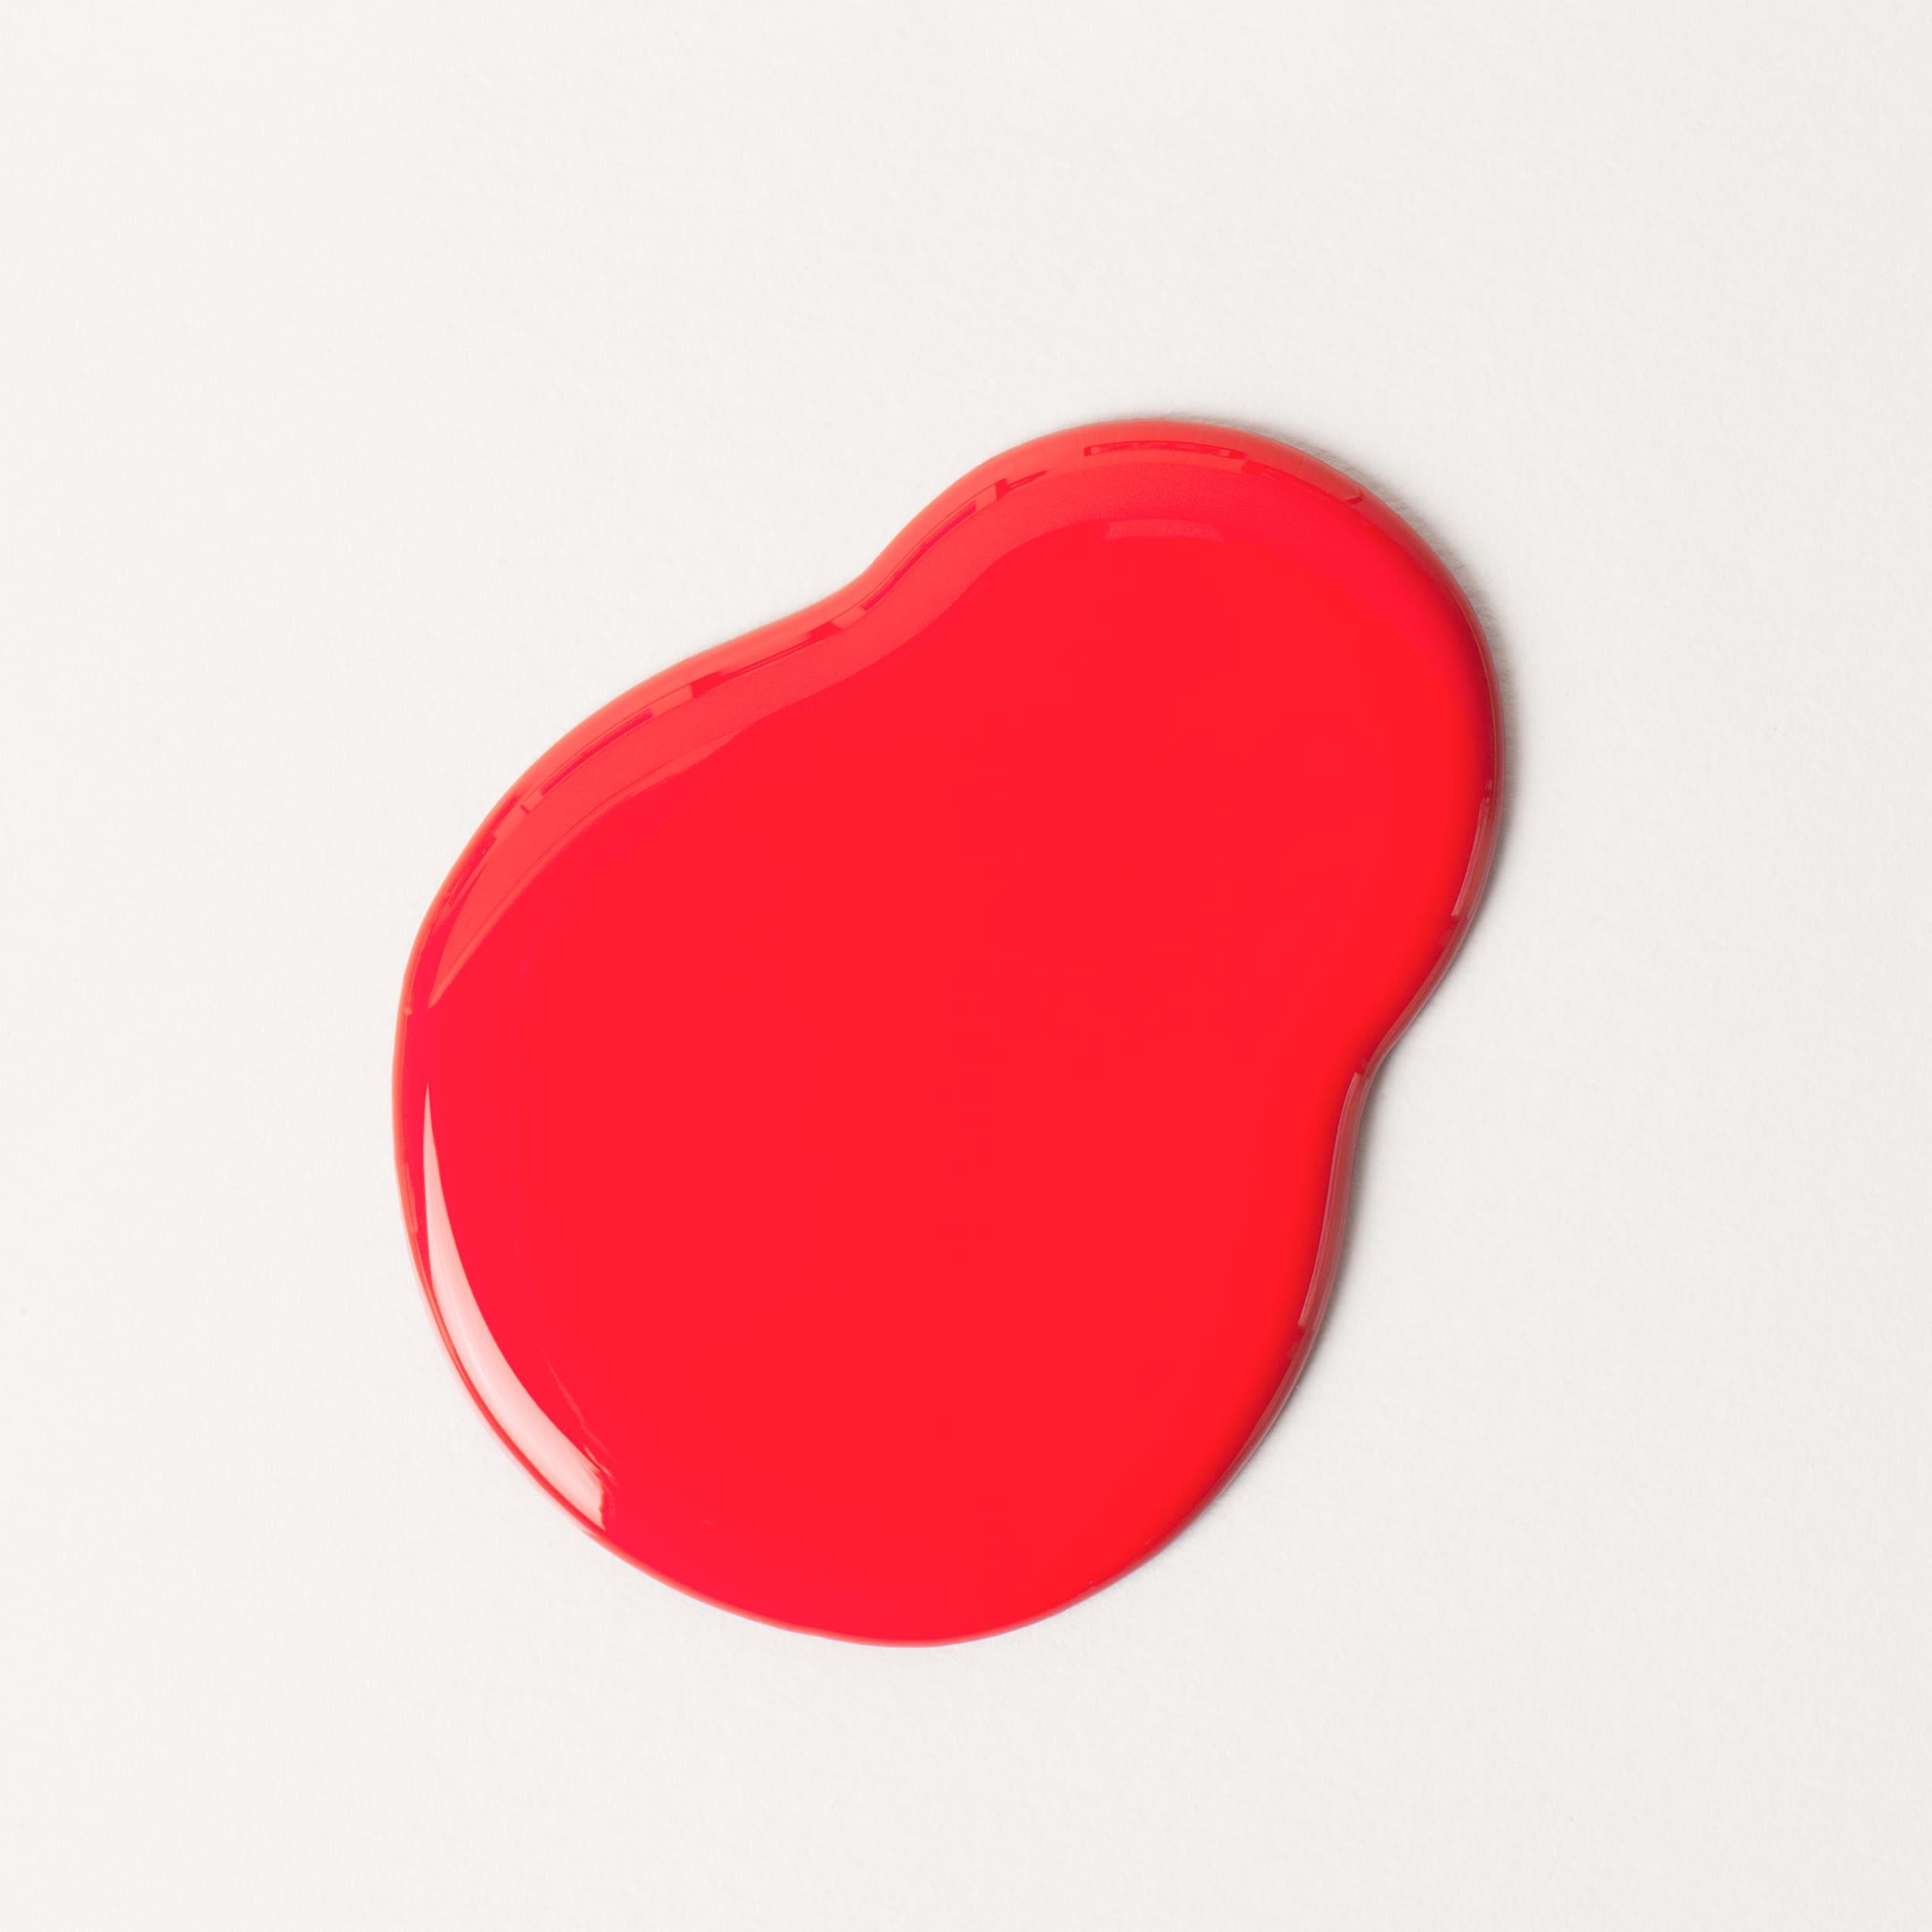 Le rouge à ongles - vernis - 3